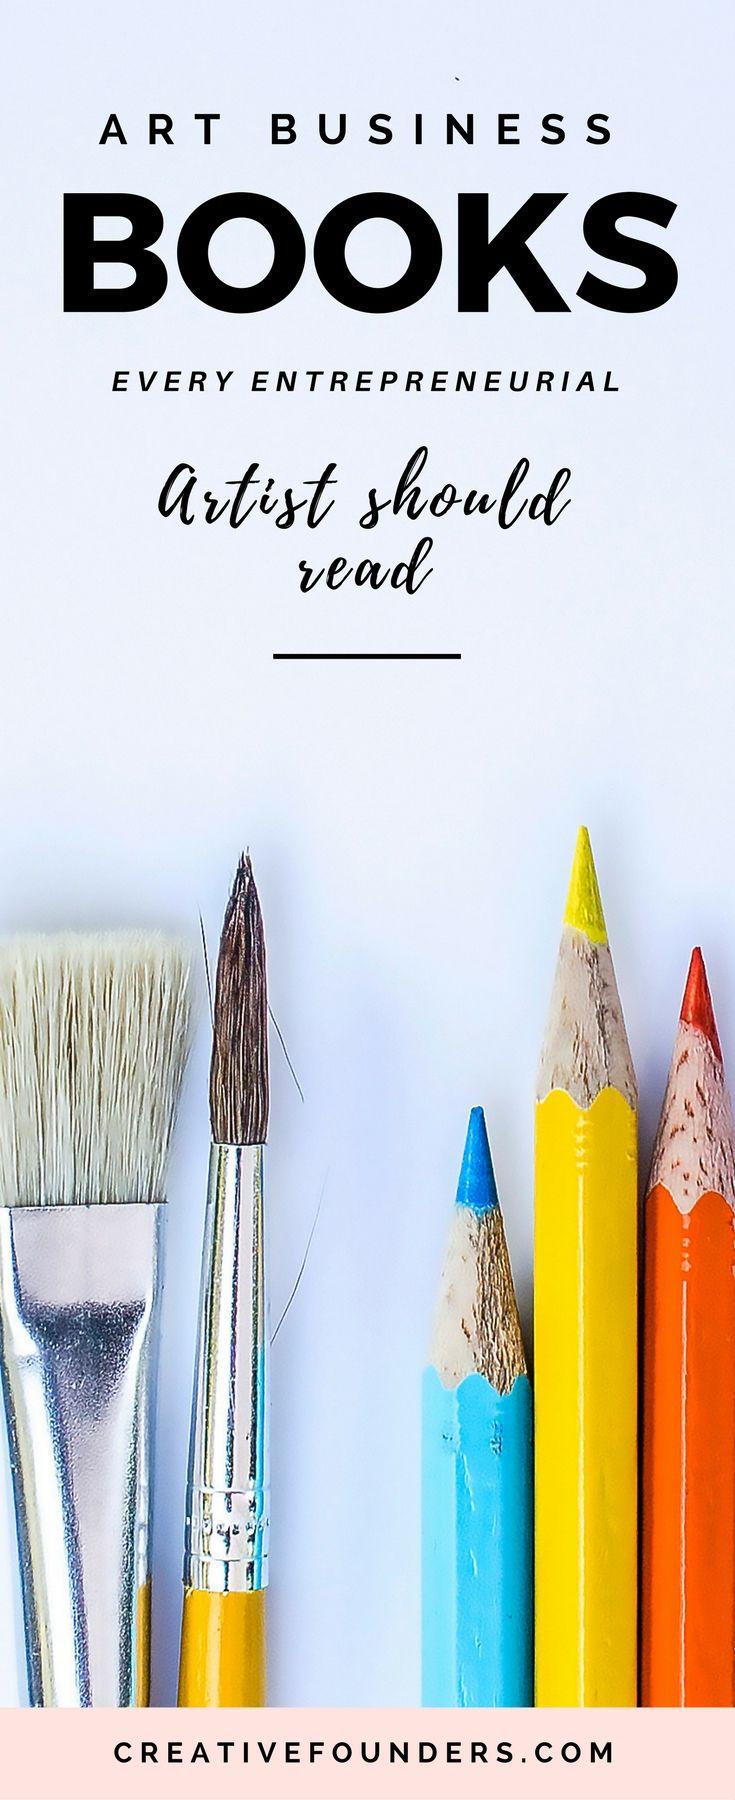 Art Business Books Every Entrepreneurial Artist Should Read // Sell Art Online // Artist Marketing Tips // Art Business Inspiration // Business Books // Reading List